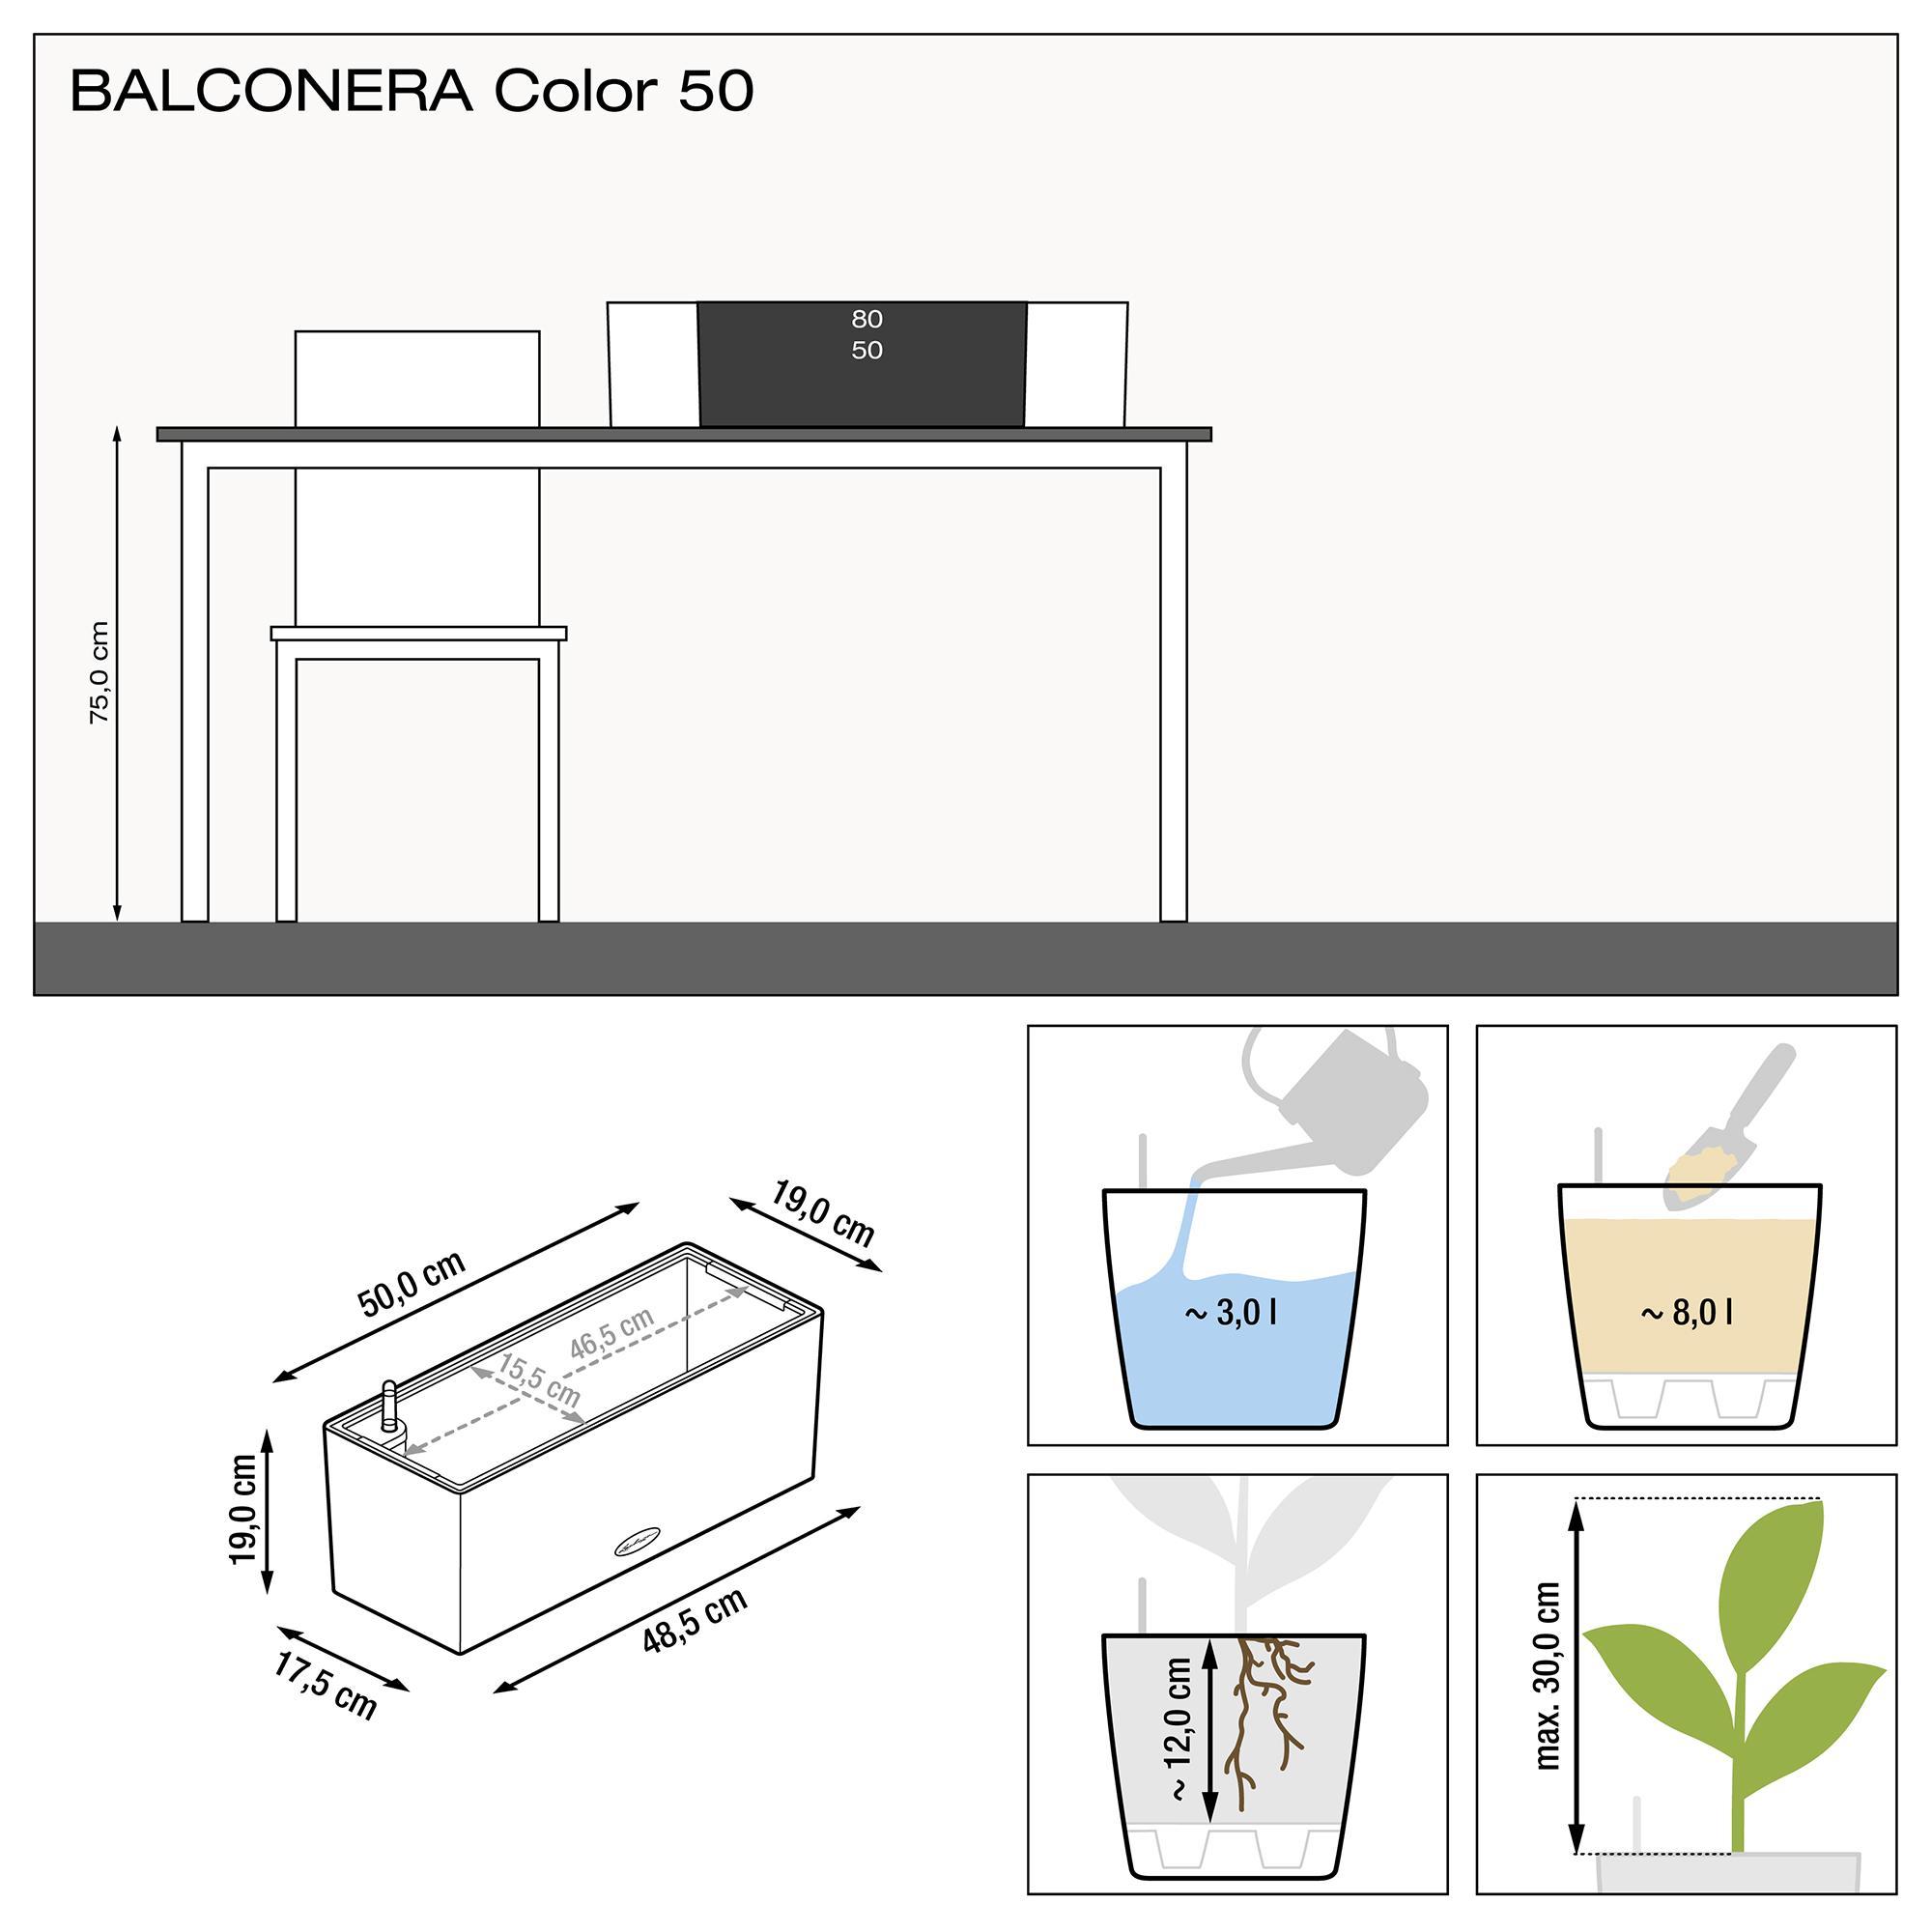 BALCONERA Color 50 weiß - Bild 3